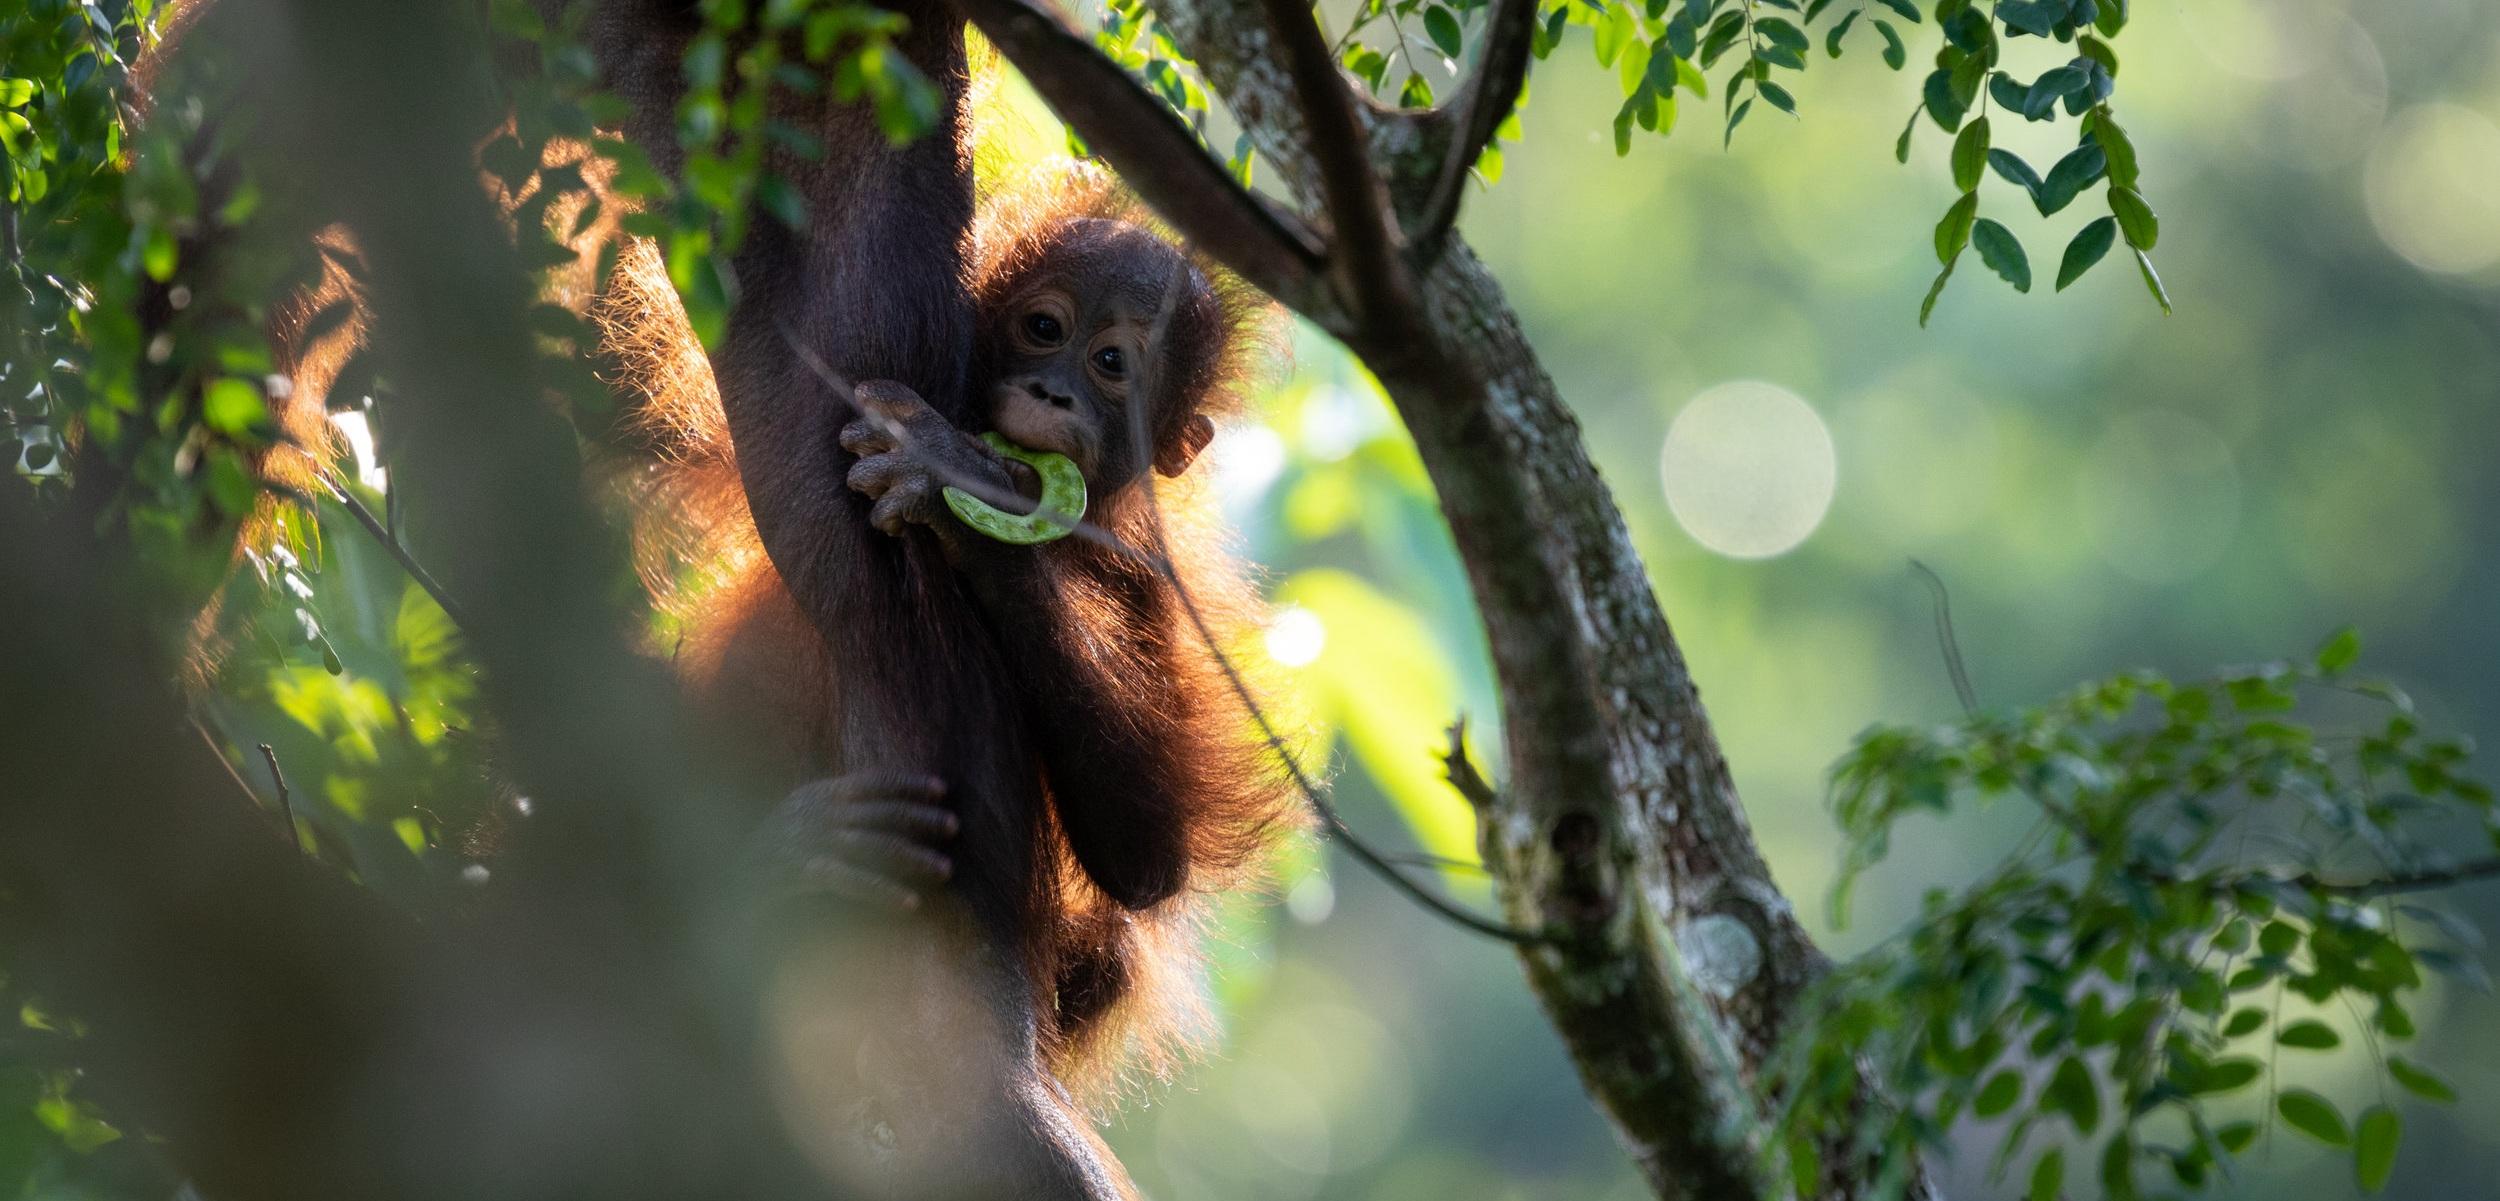 Bornean orangutan (Pongo pygmaeus) eating beans and clinging to mother's leg in Sepilok, Malaysia.